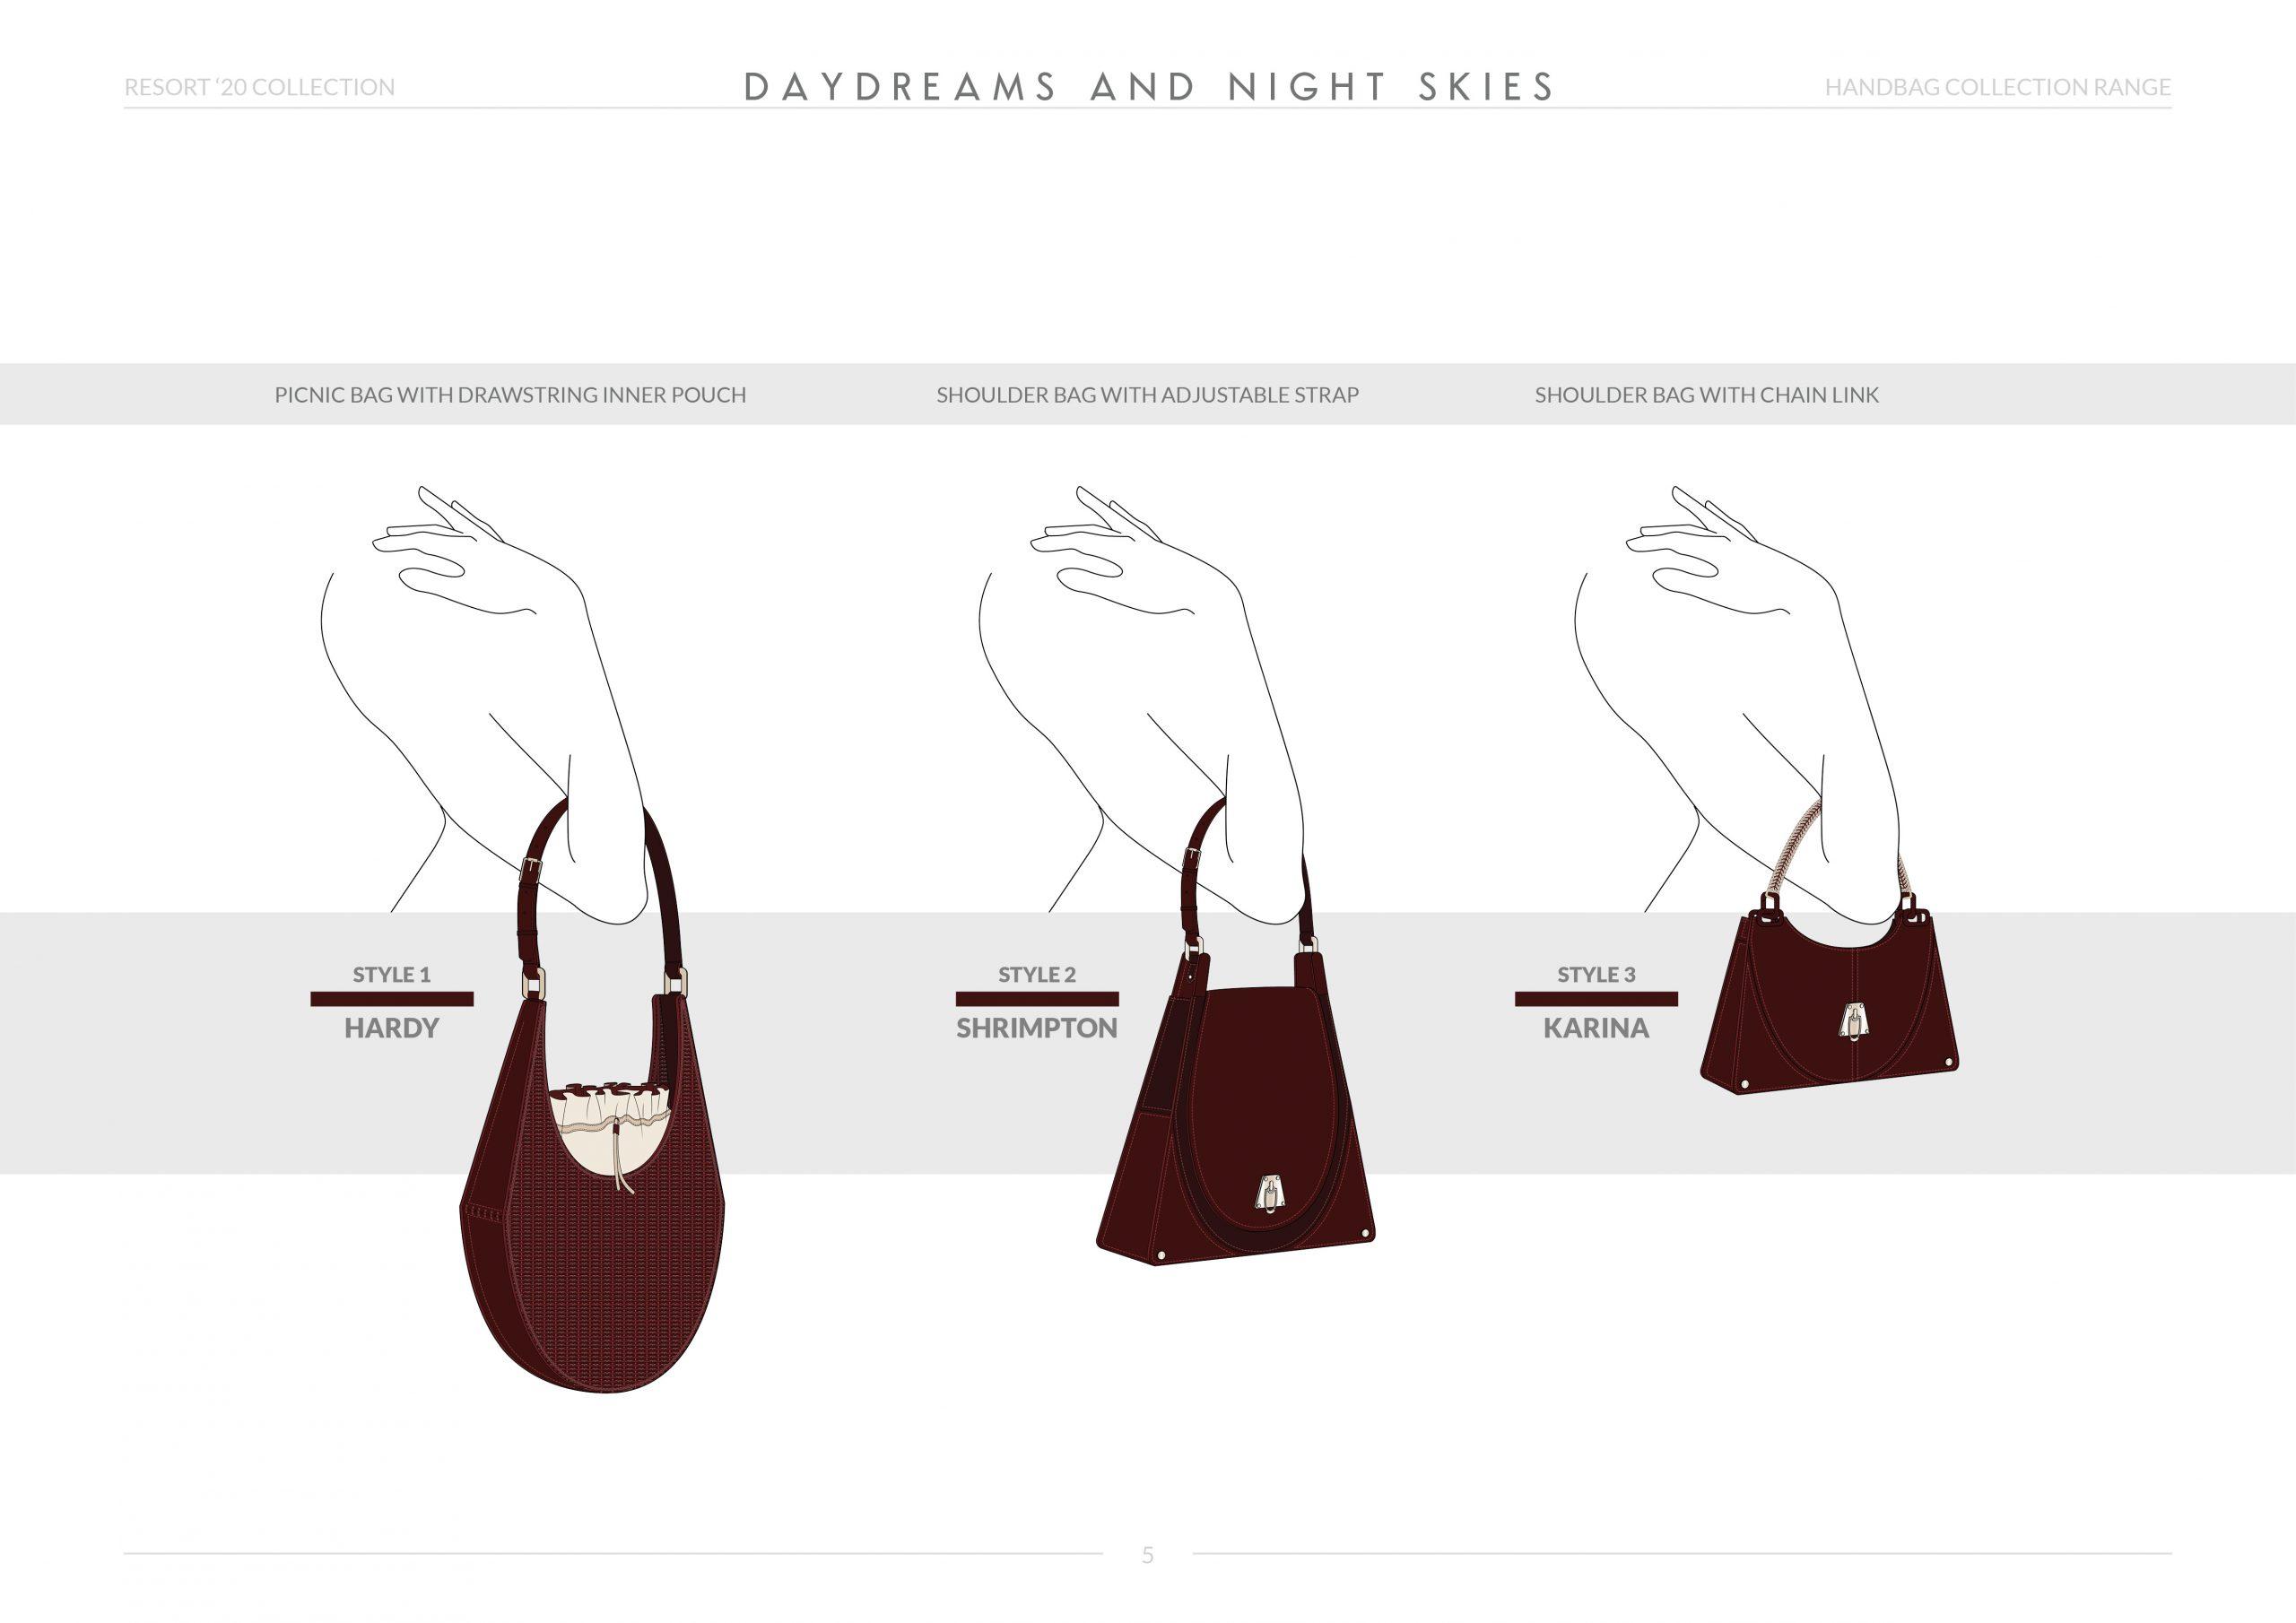 Resort-20 Womens Handbag Collection Range